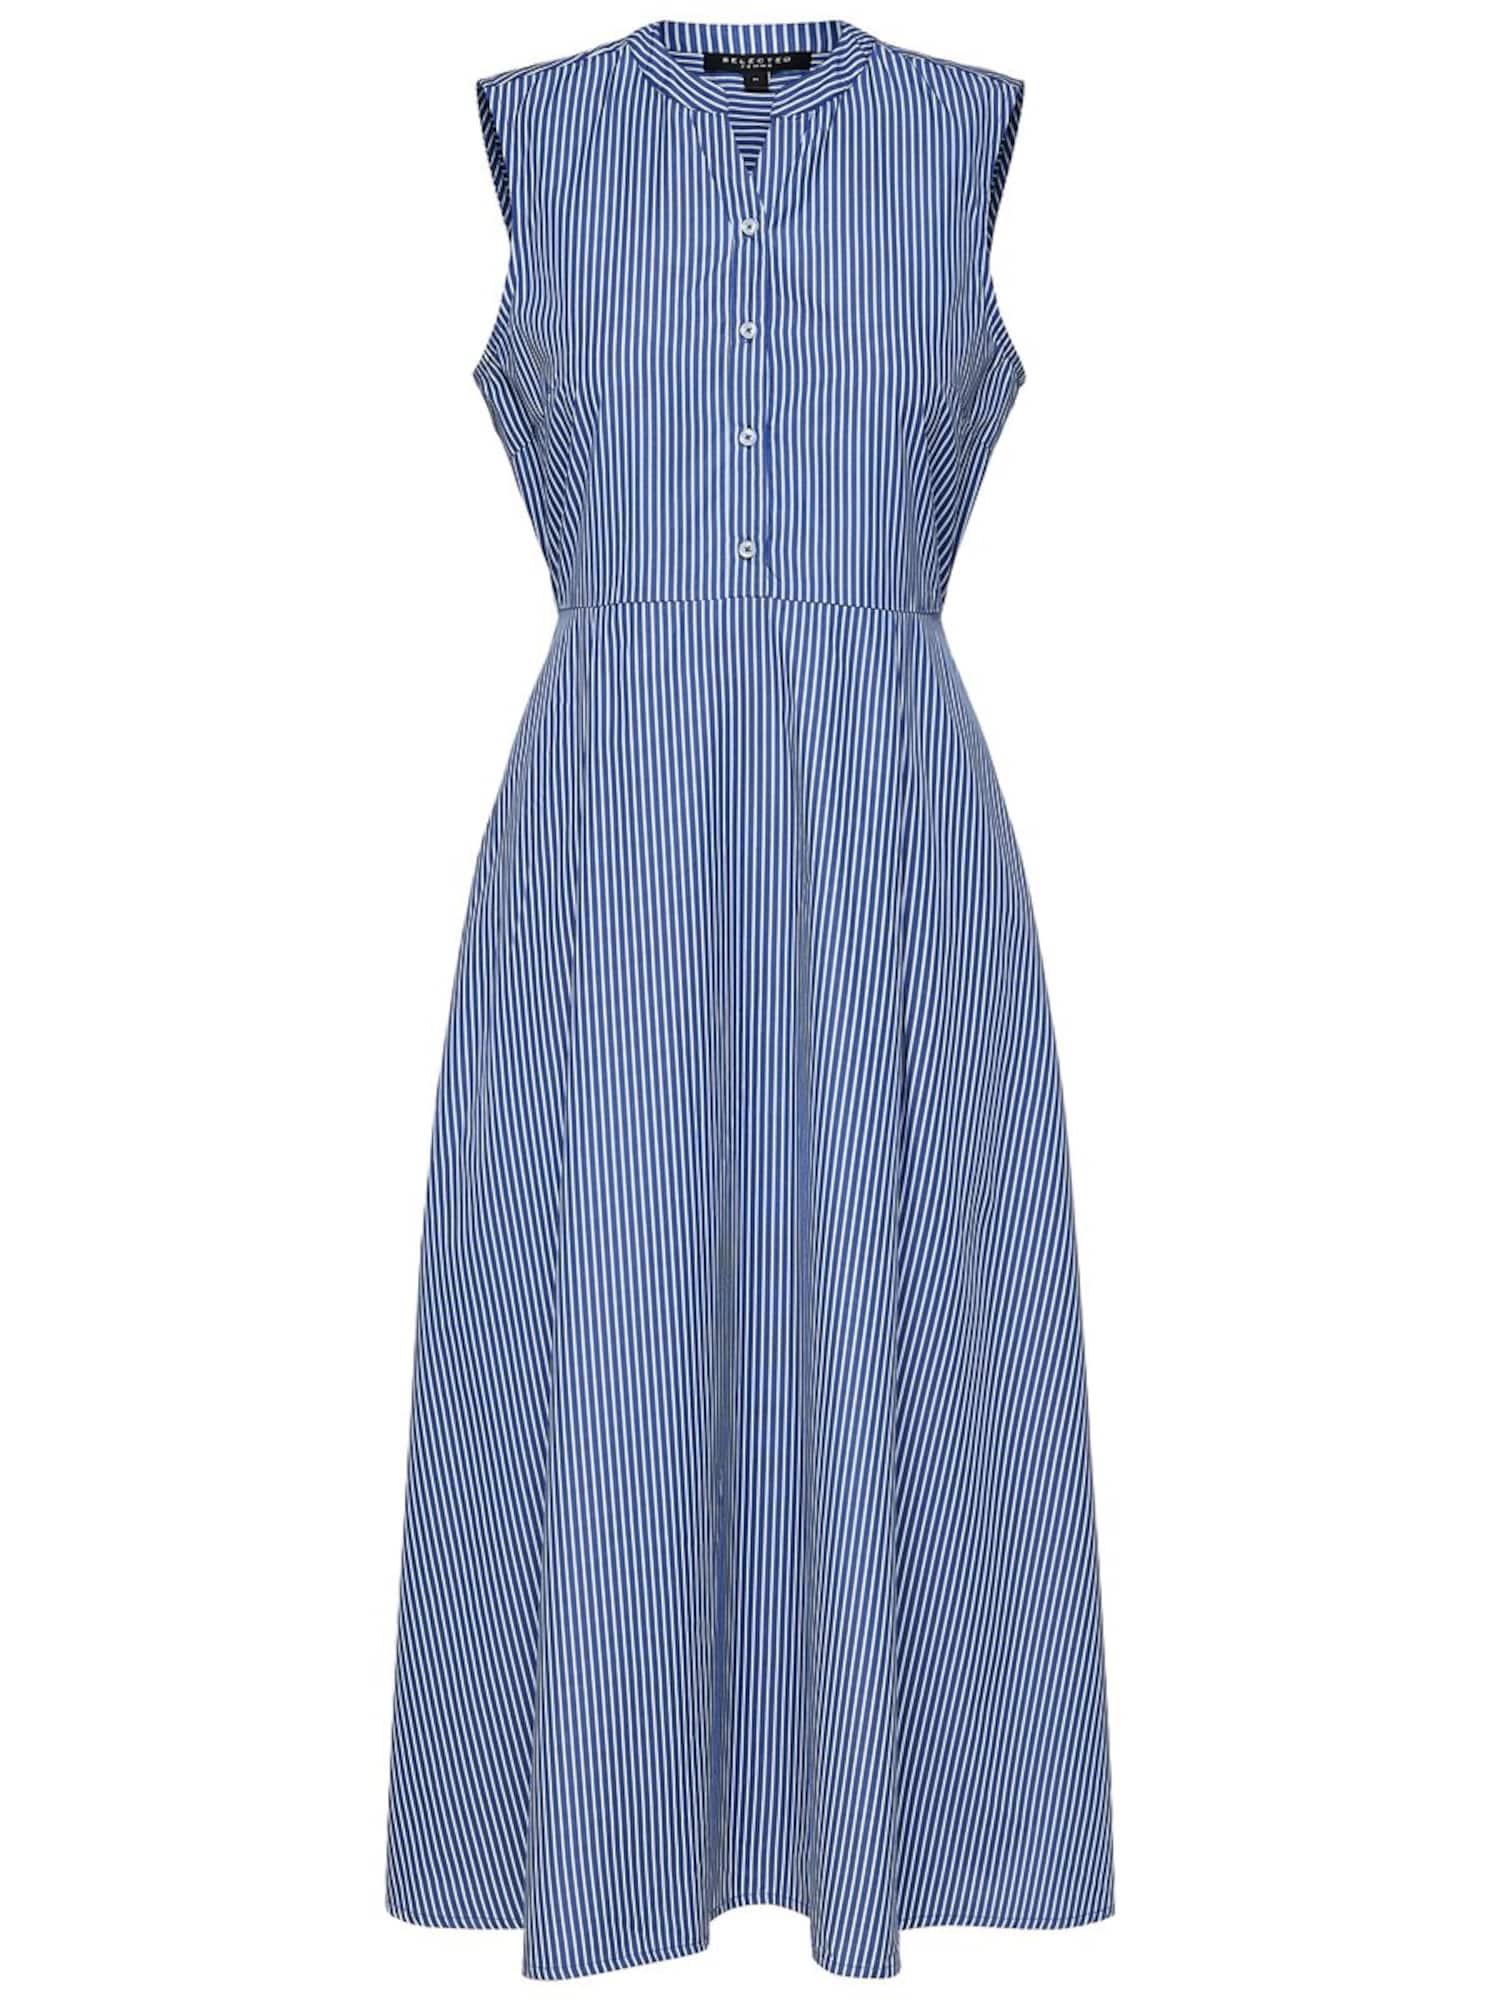 Košilové šaty Althea modrá bílá SELECTED FEMME